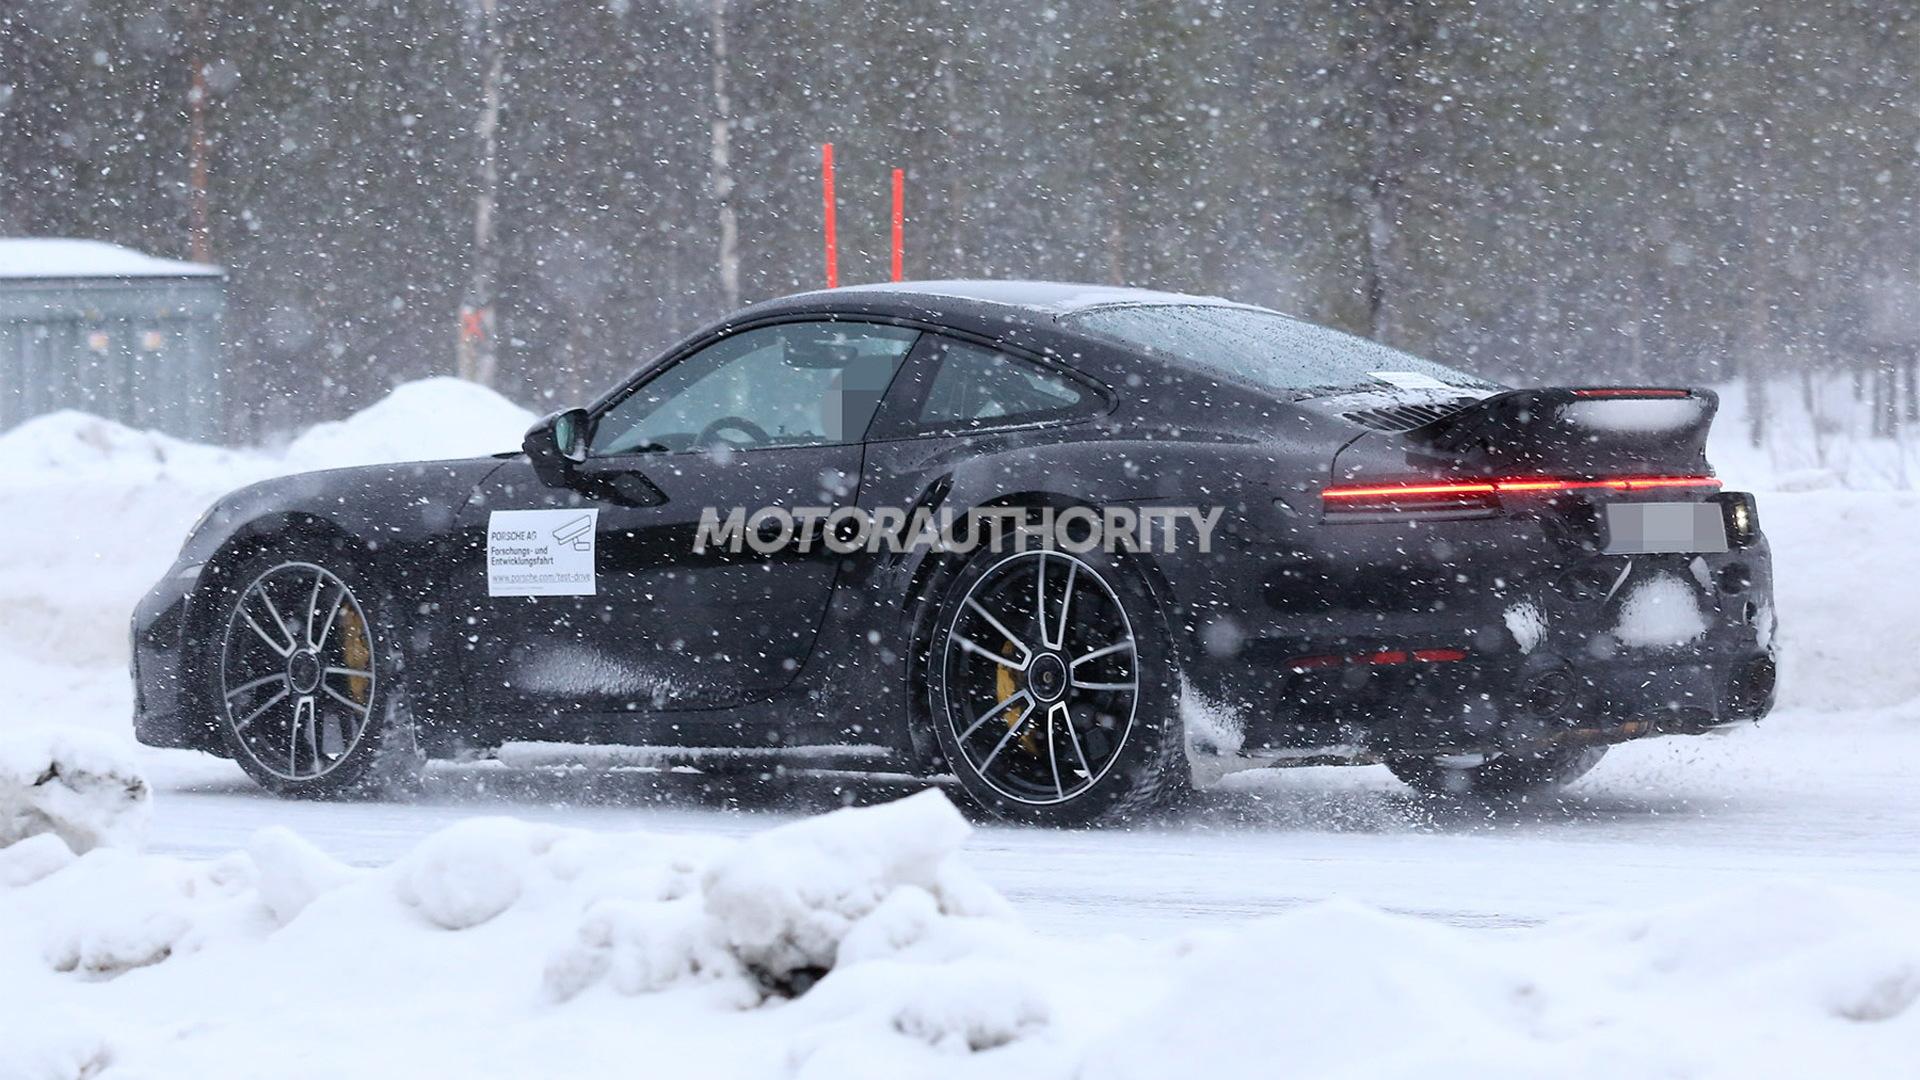 2021 Porsche 911 Turbo with ducktail spoiler spy shots - Photo credit:S. Baldauf/SB-Medien